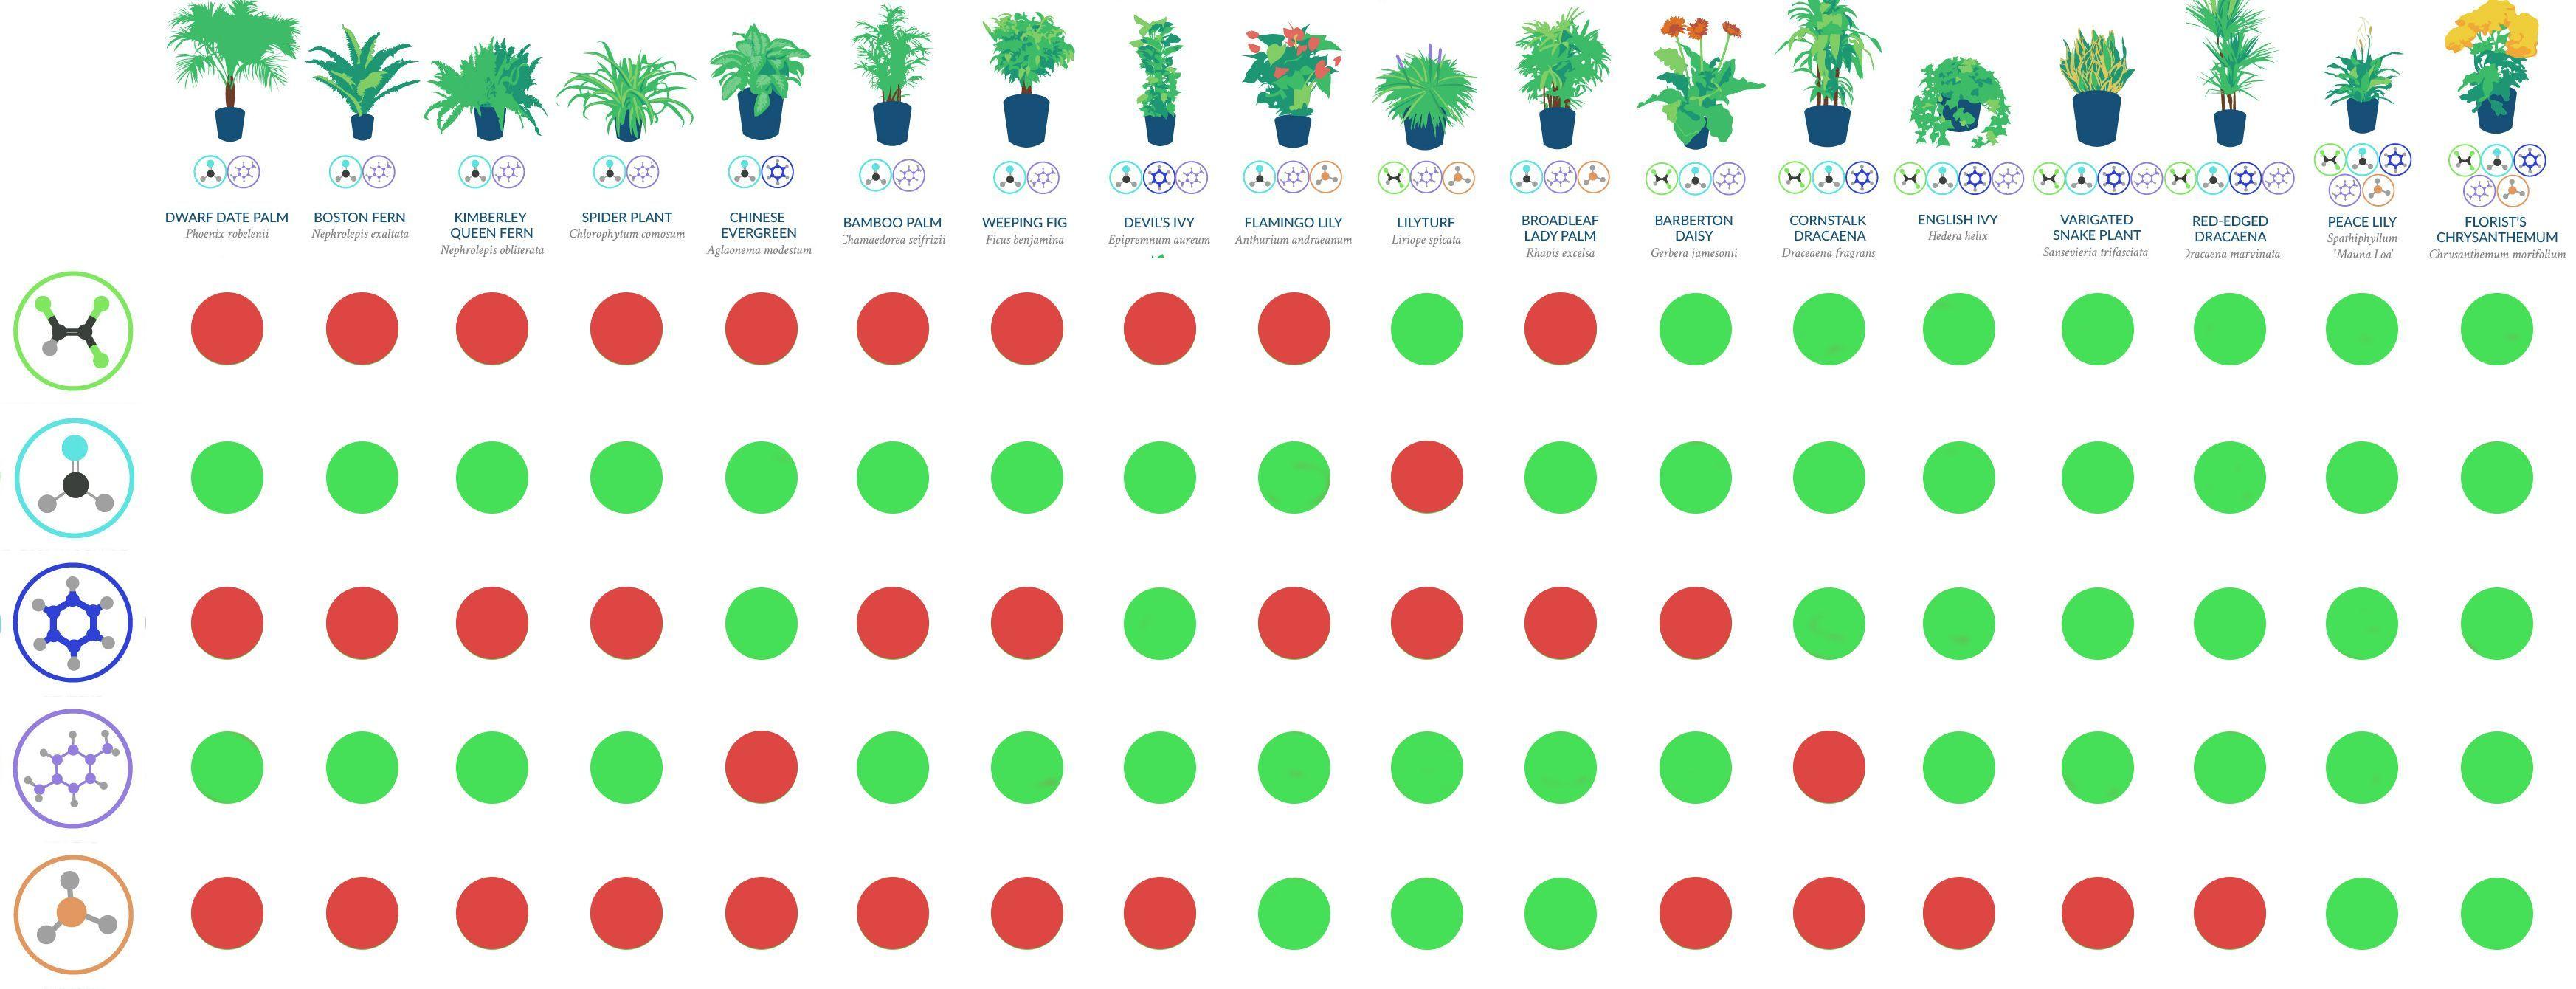 nasa guide to air filtering houseplants pdf Google